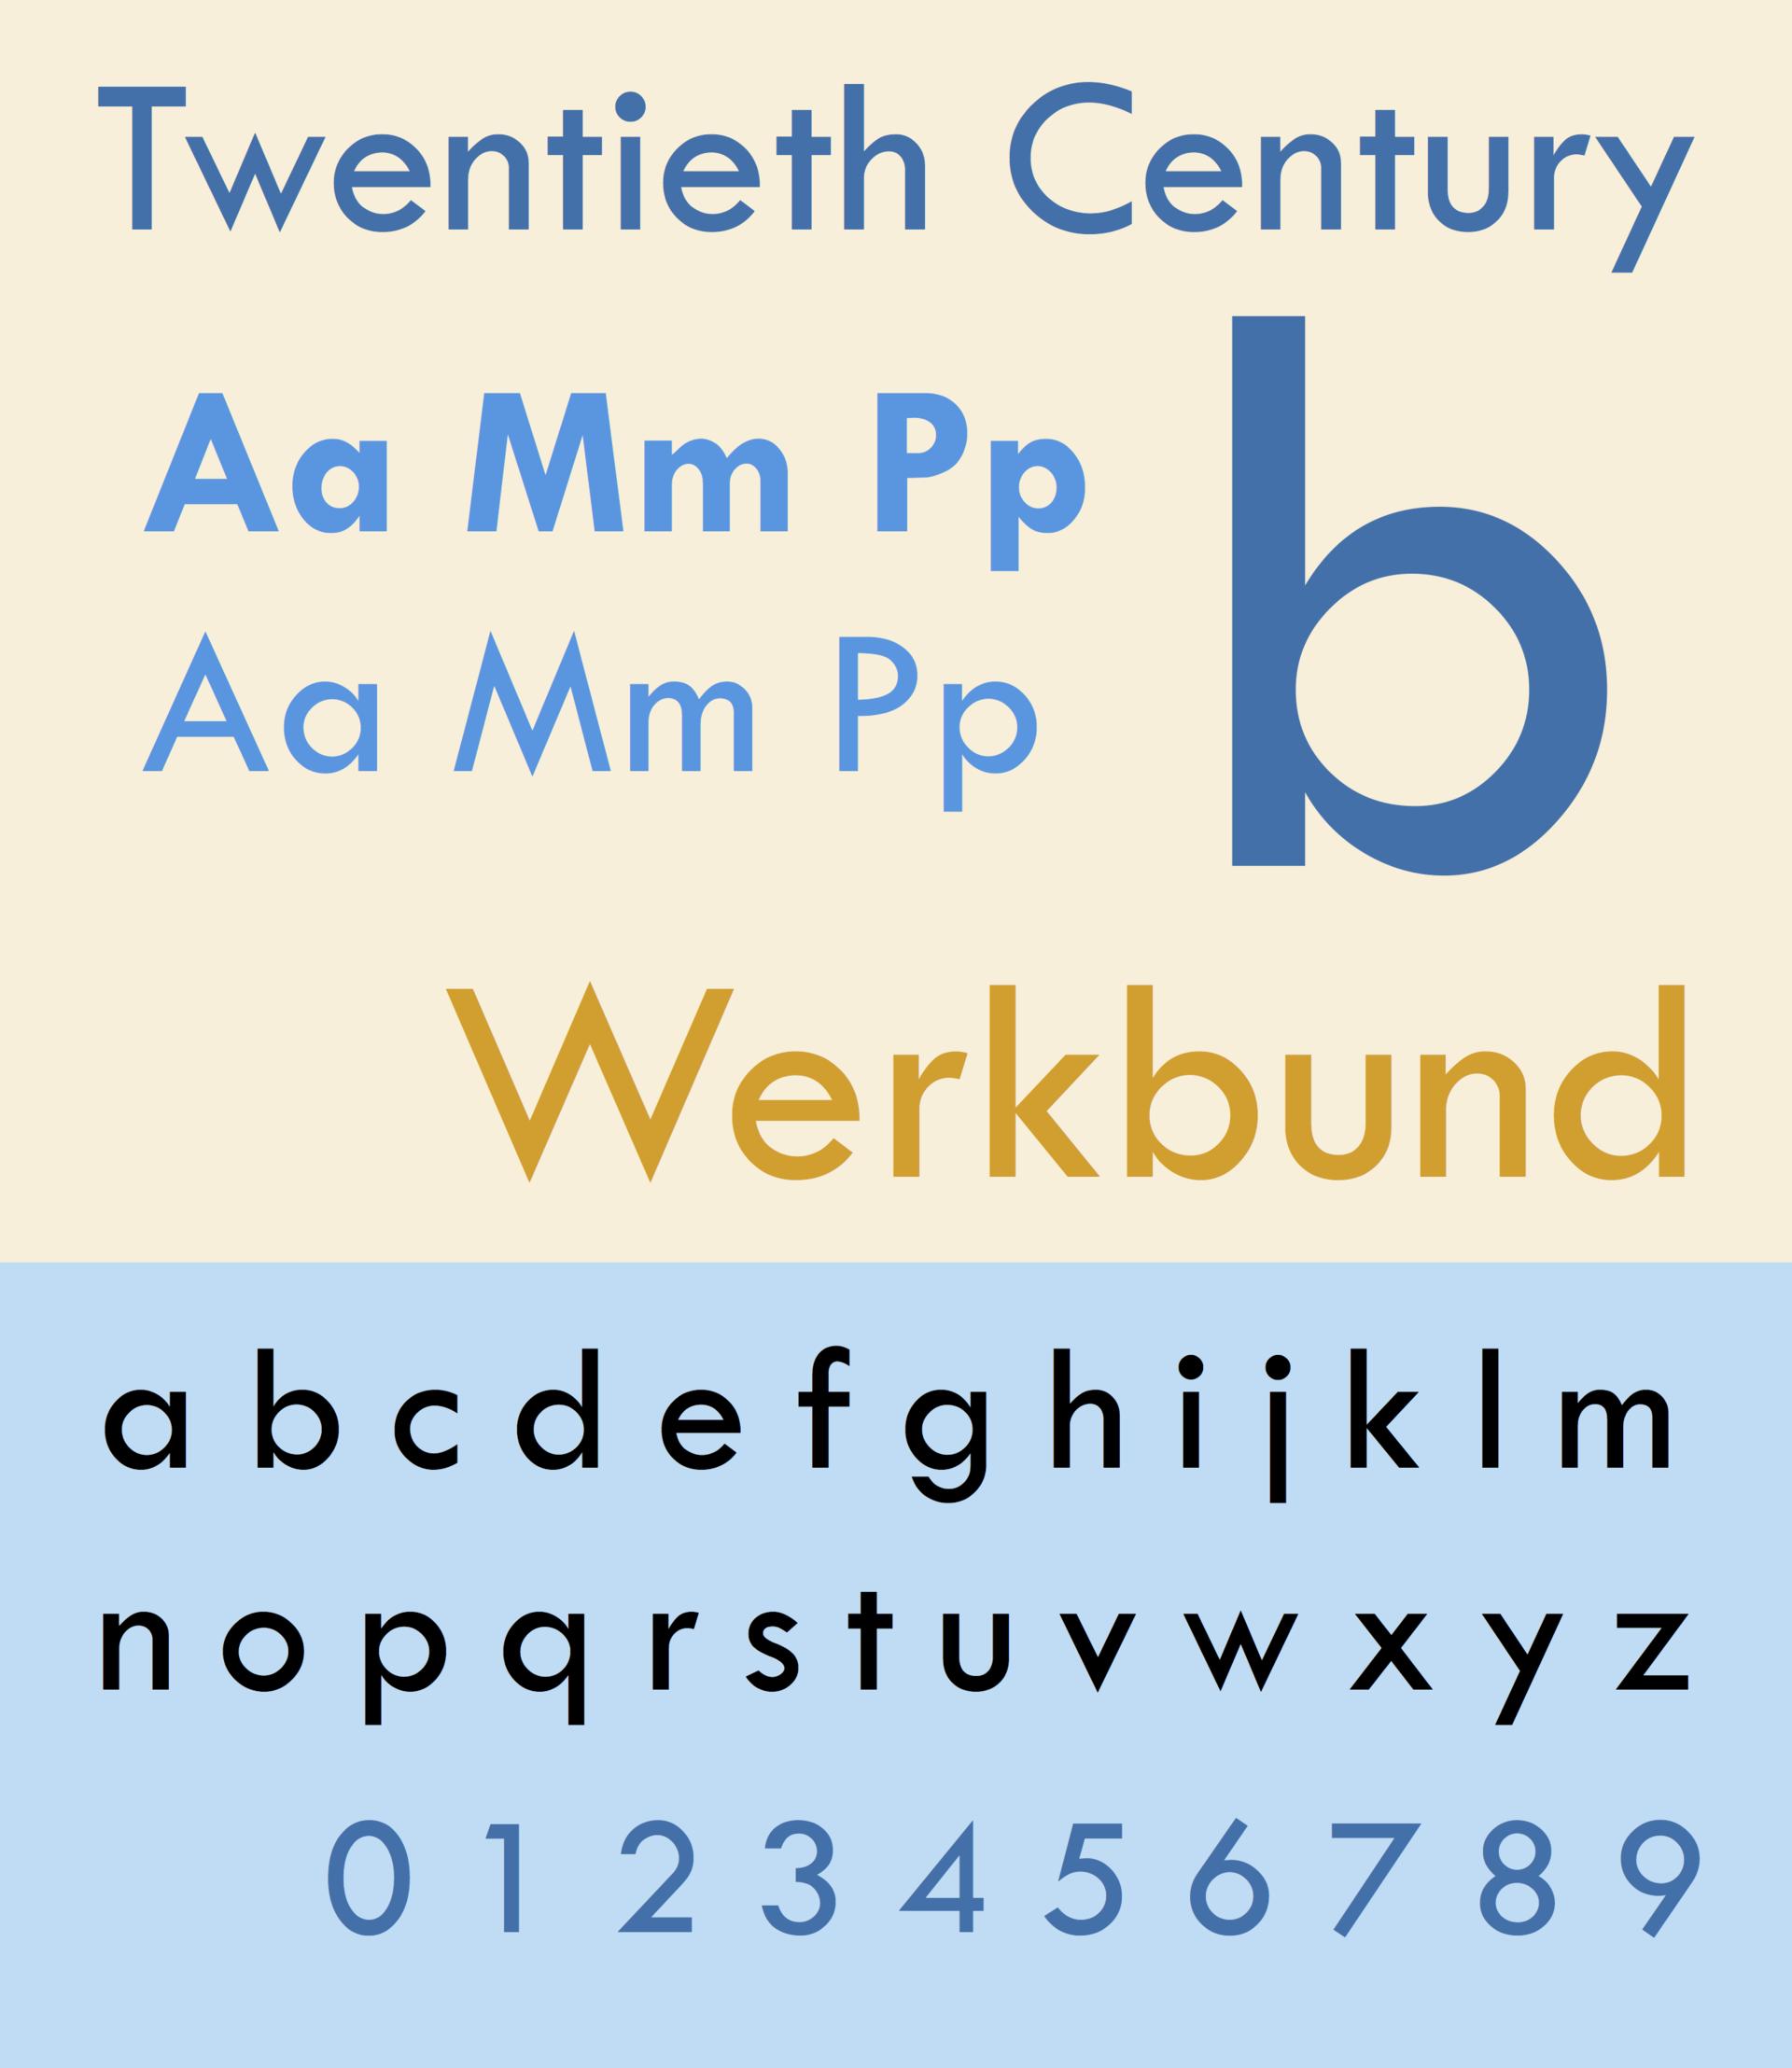 twentieth century typeface wikipedia